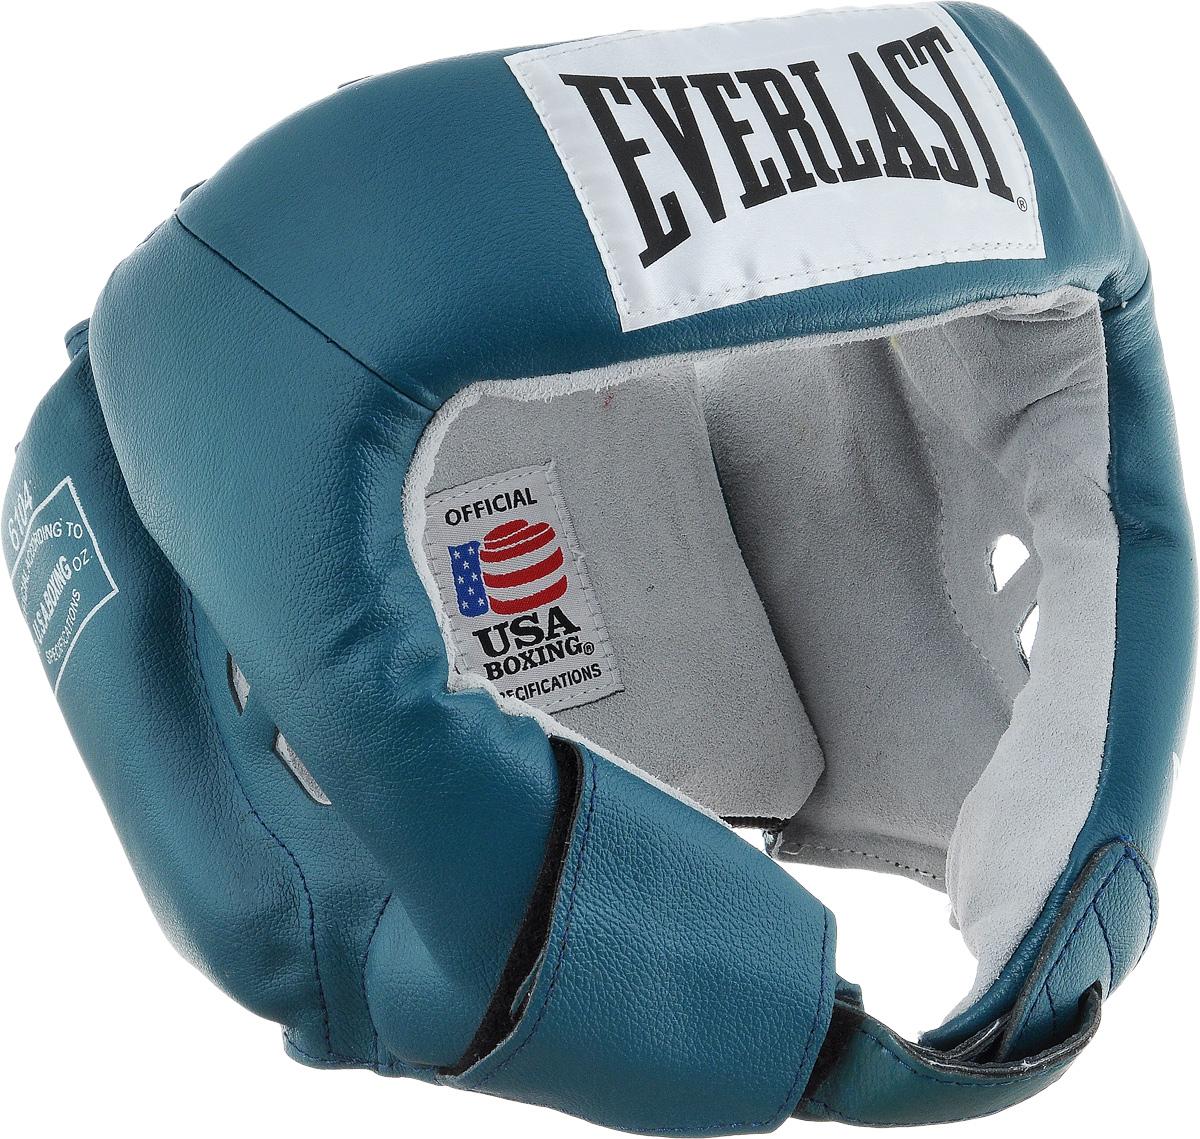 "Шлем боксерский Everlast ""USA Boxing"", цвет: бирюзовый, белый. Размер L 610406U"